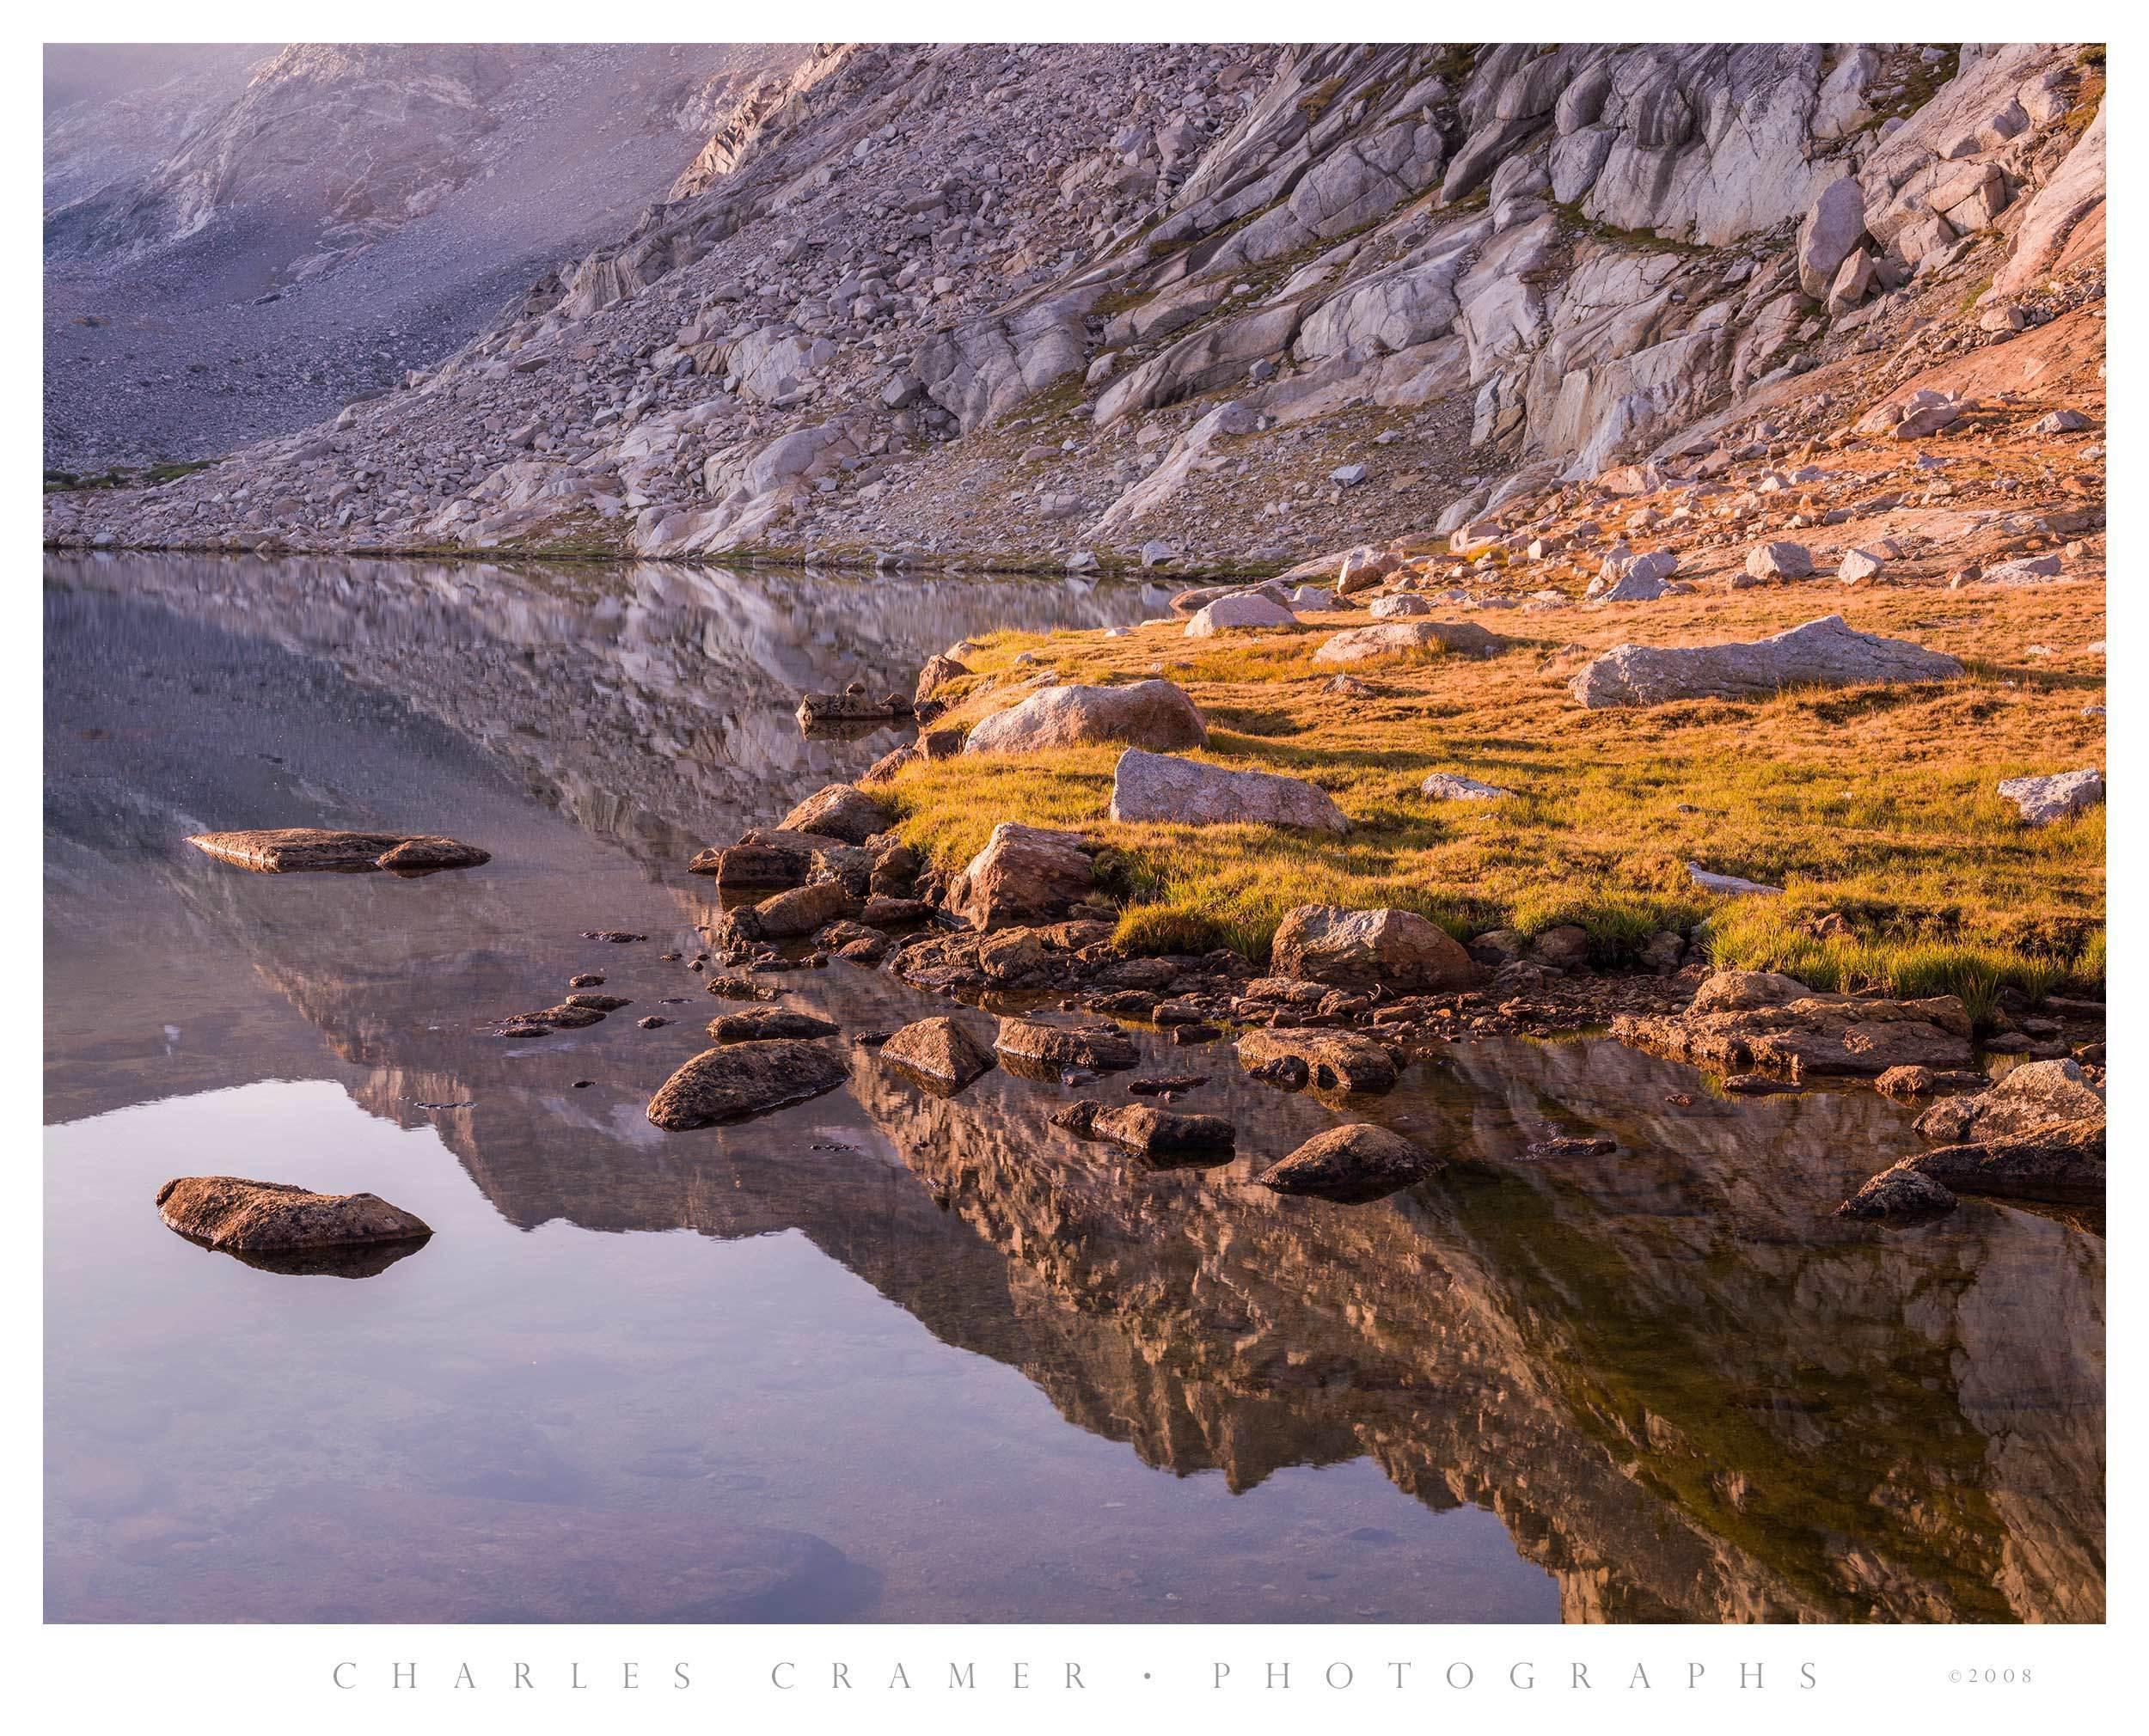 Alpine Lake, Yosemite Backcountry, Yosemite